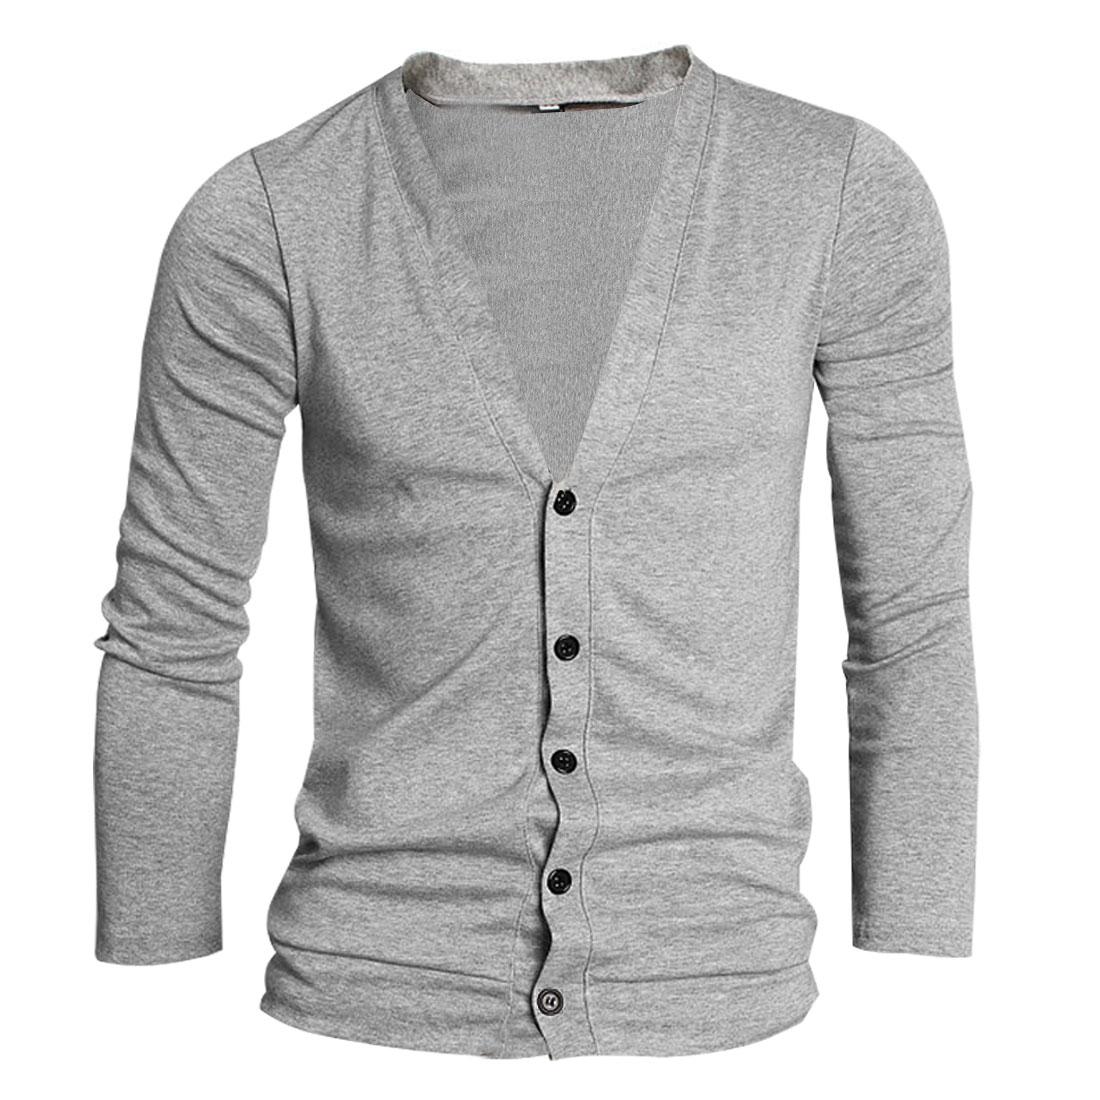 Men Gray Fashion Simple Design Button Down Stretchy Deep V Neckline Cardigan S